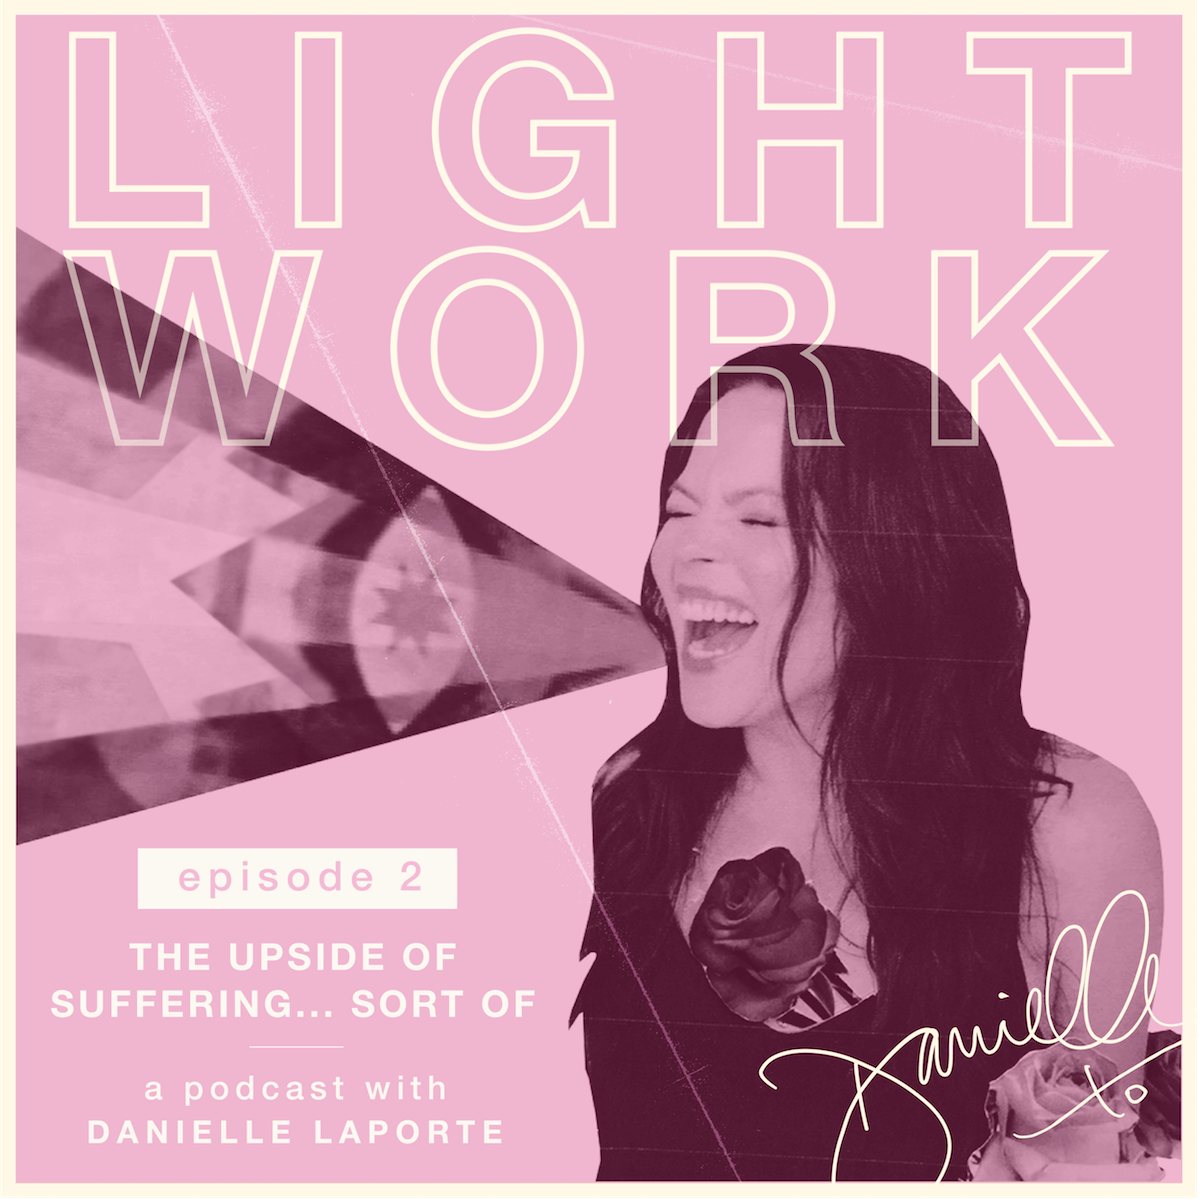 The-Upside-of-suffering-DanielleLaporte.LightWork.Episode2_EmailHeader.1200x1200